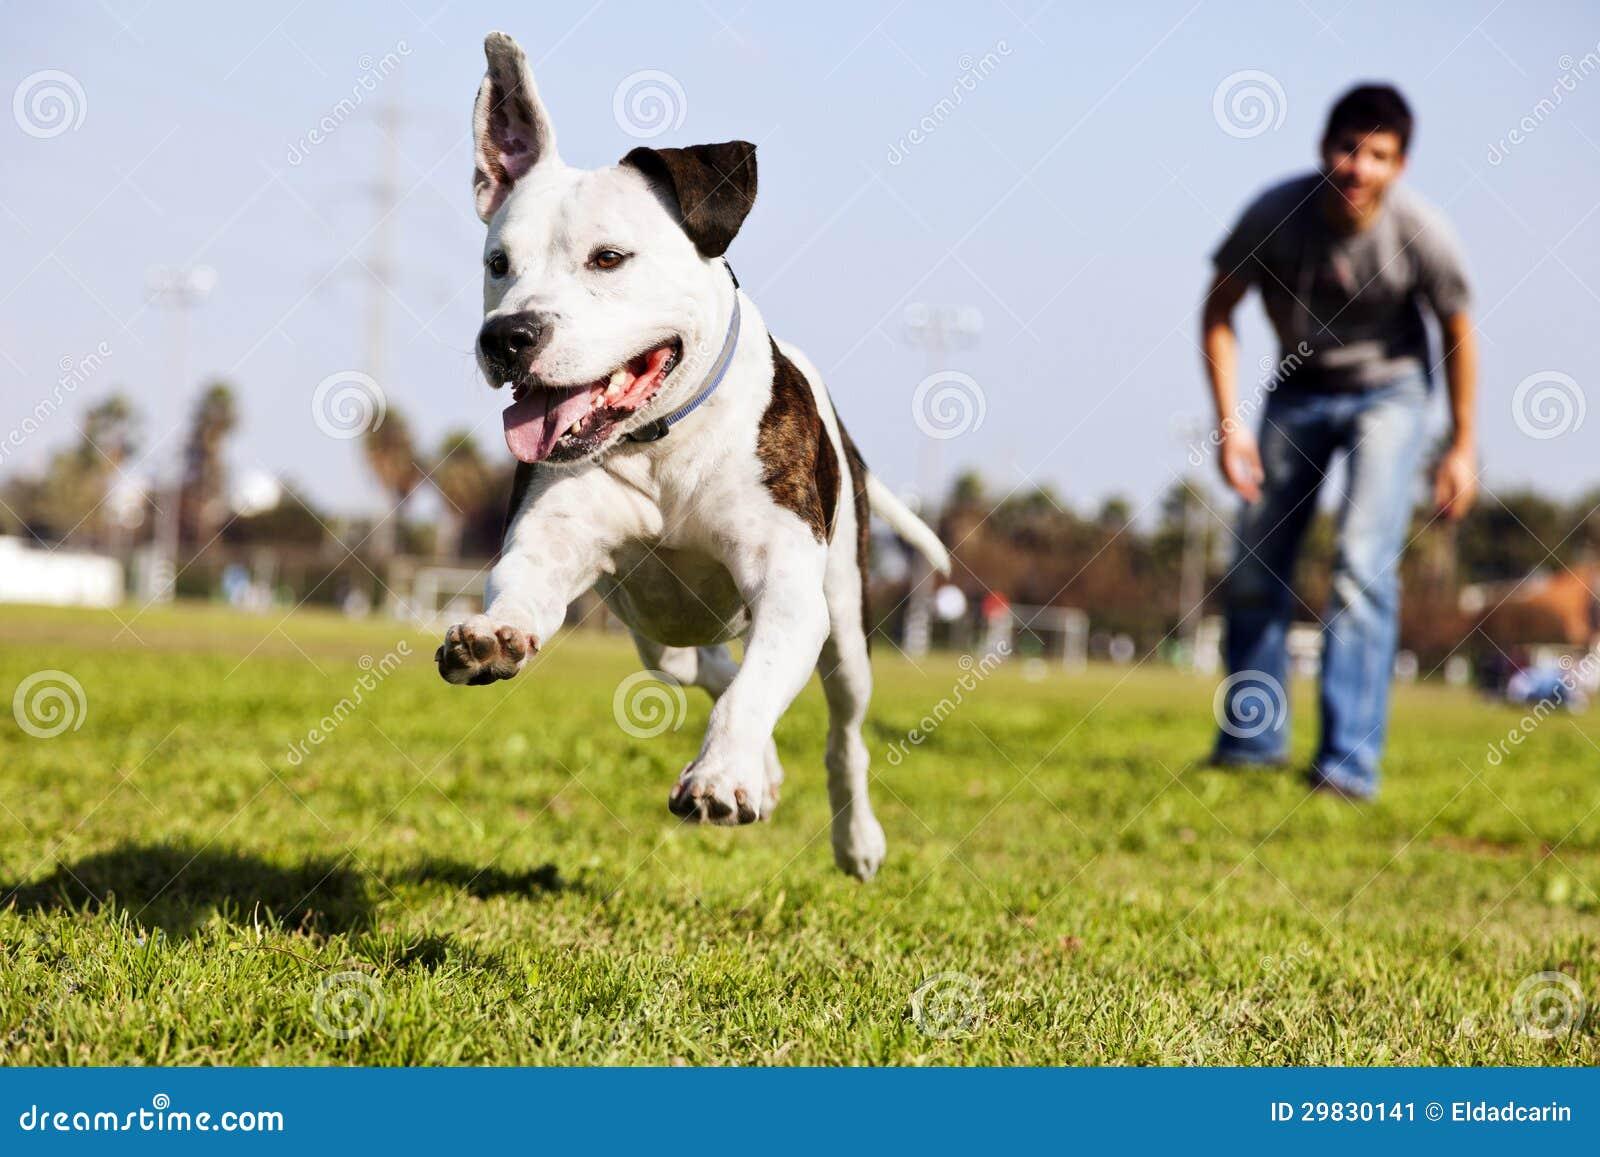 Mid-Air Running Pitbull Dog